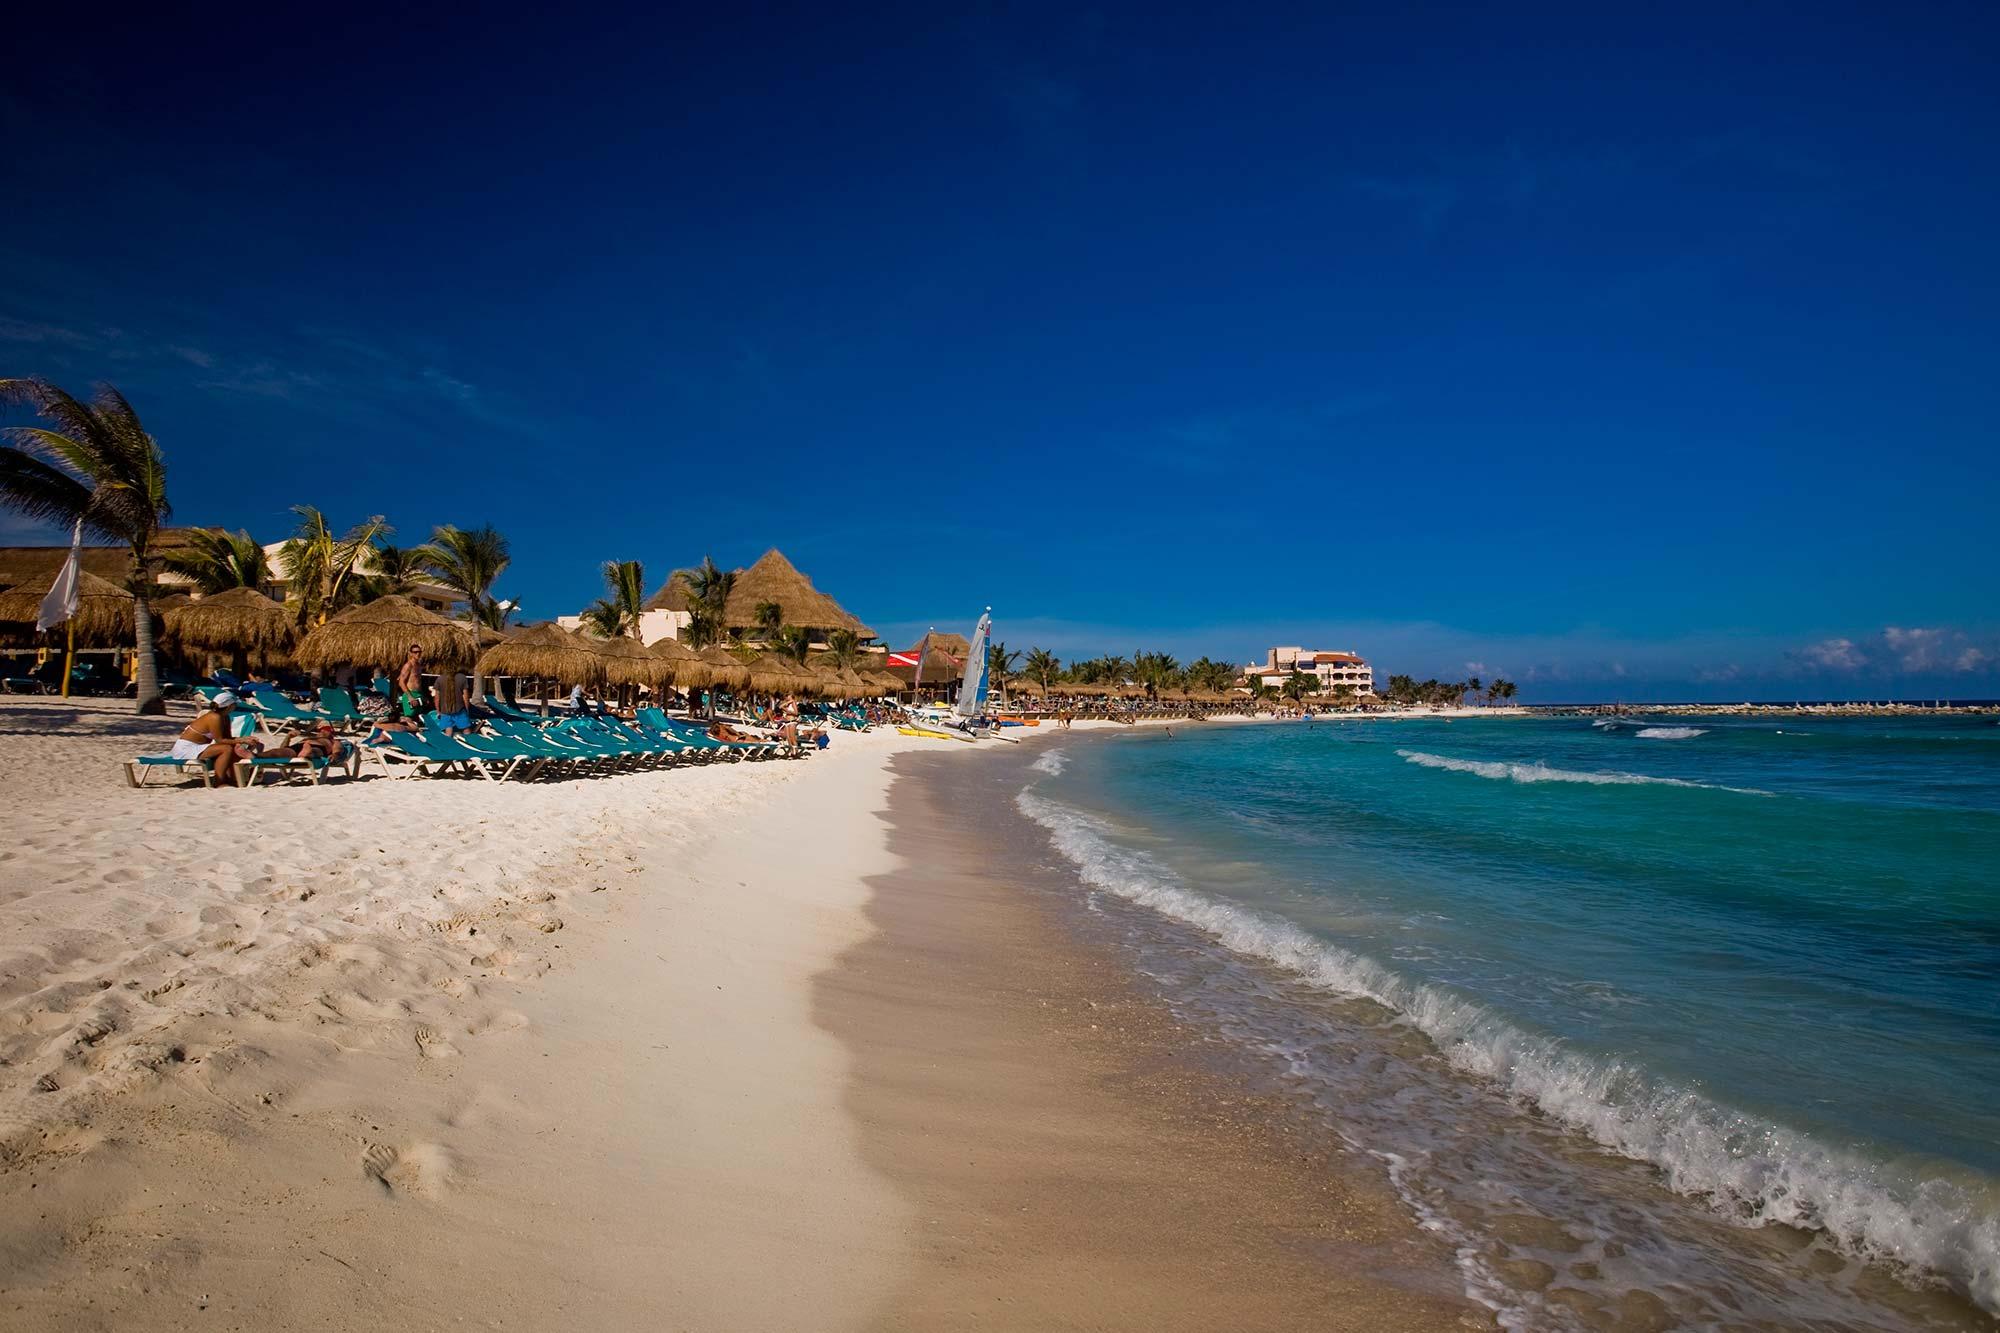 Catalonia-Riviera-Maya-Resort-&-Spa